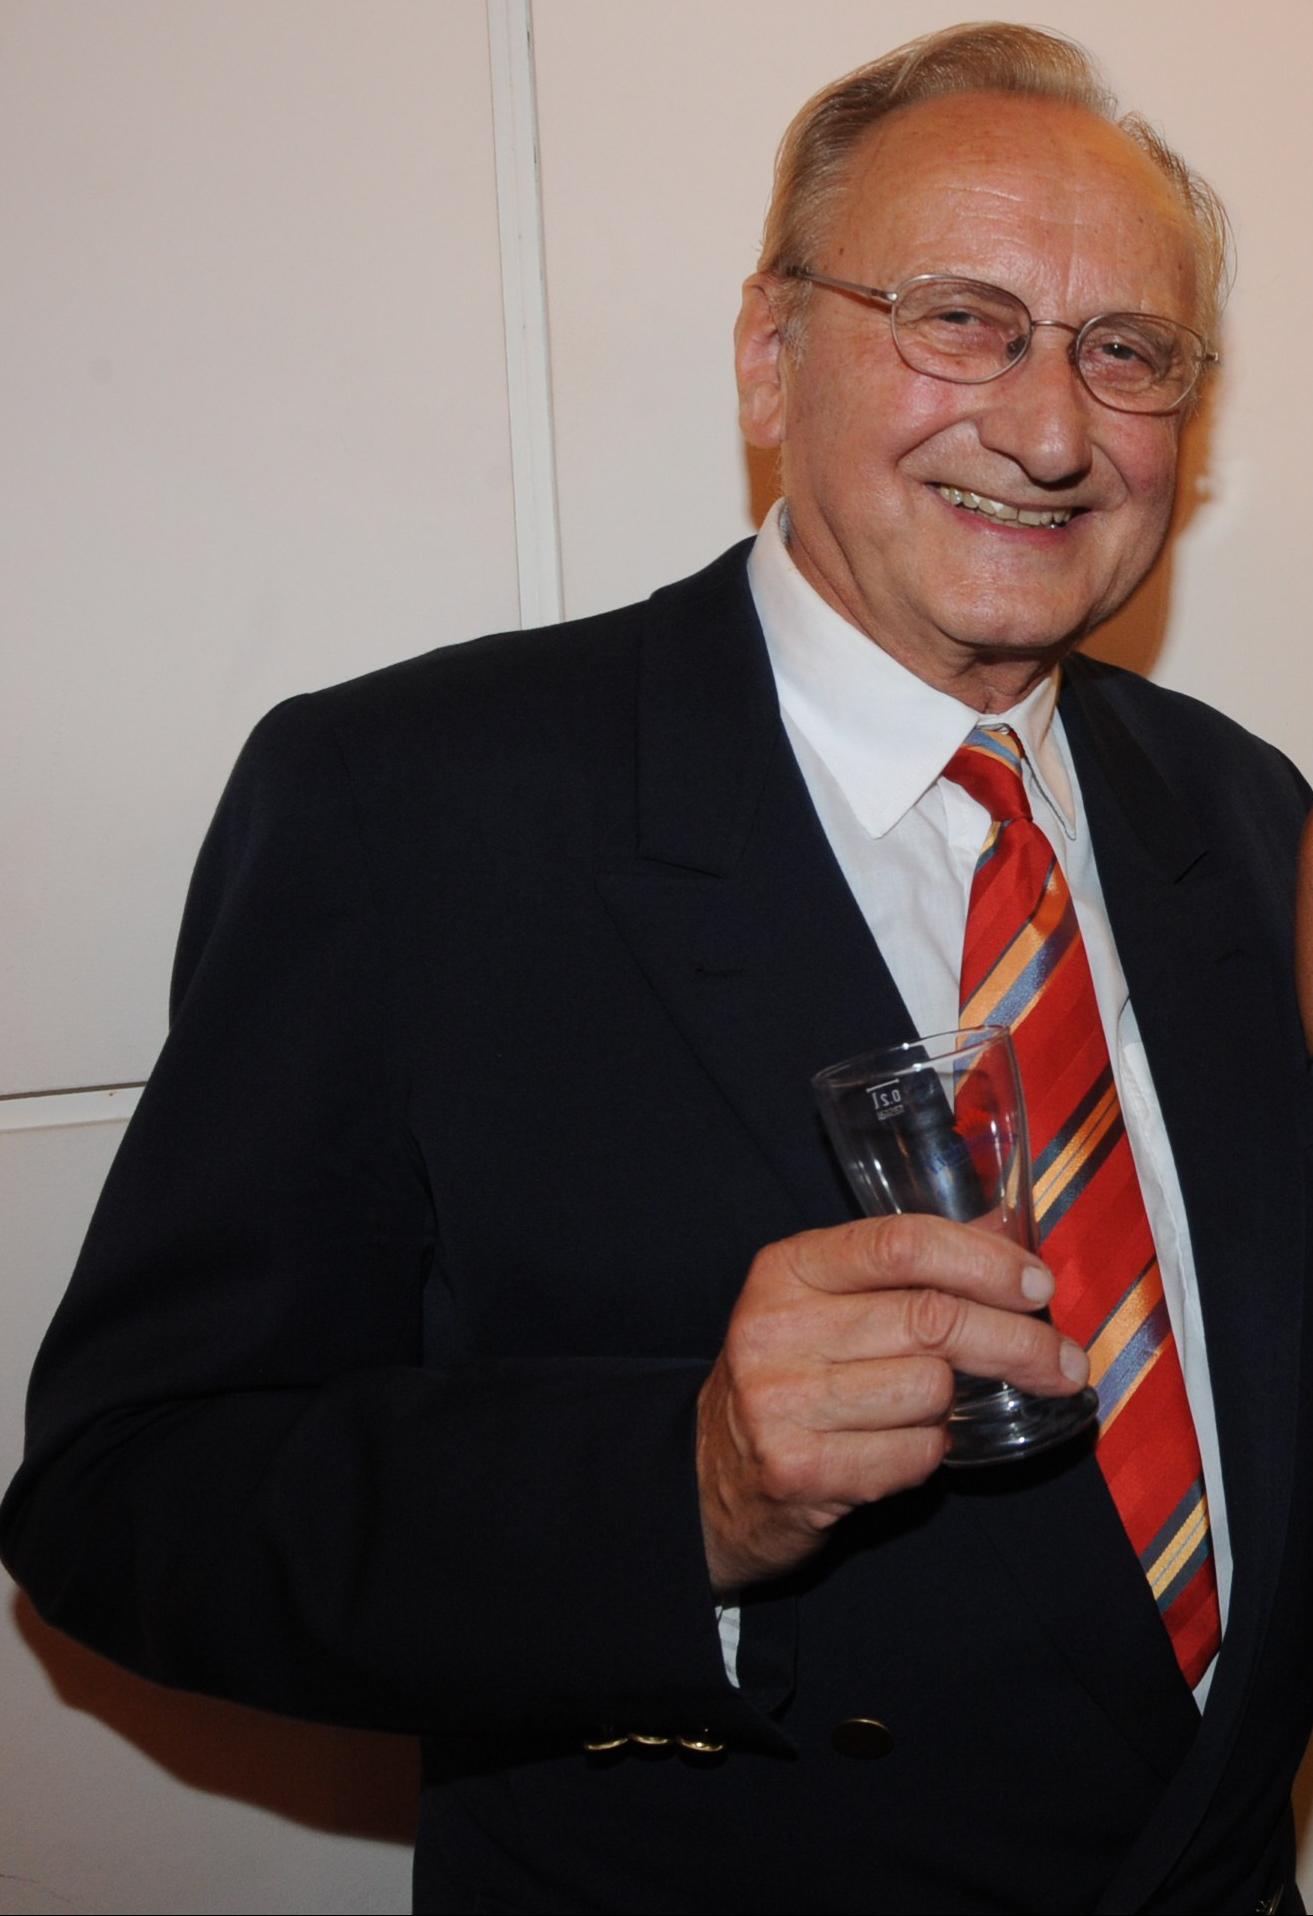 Dieter Wien